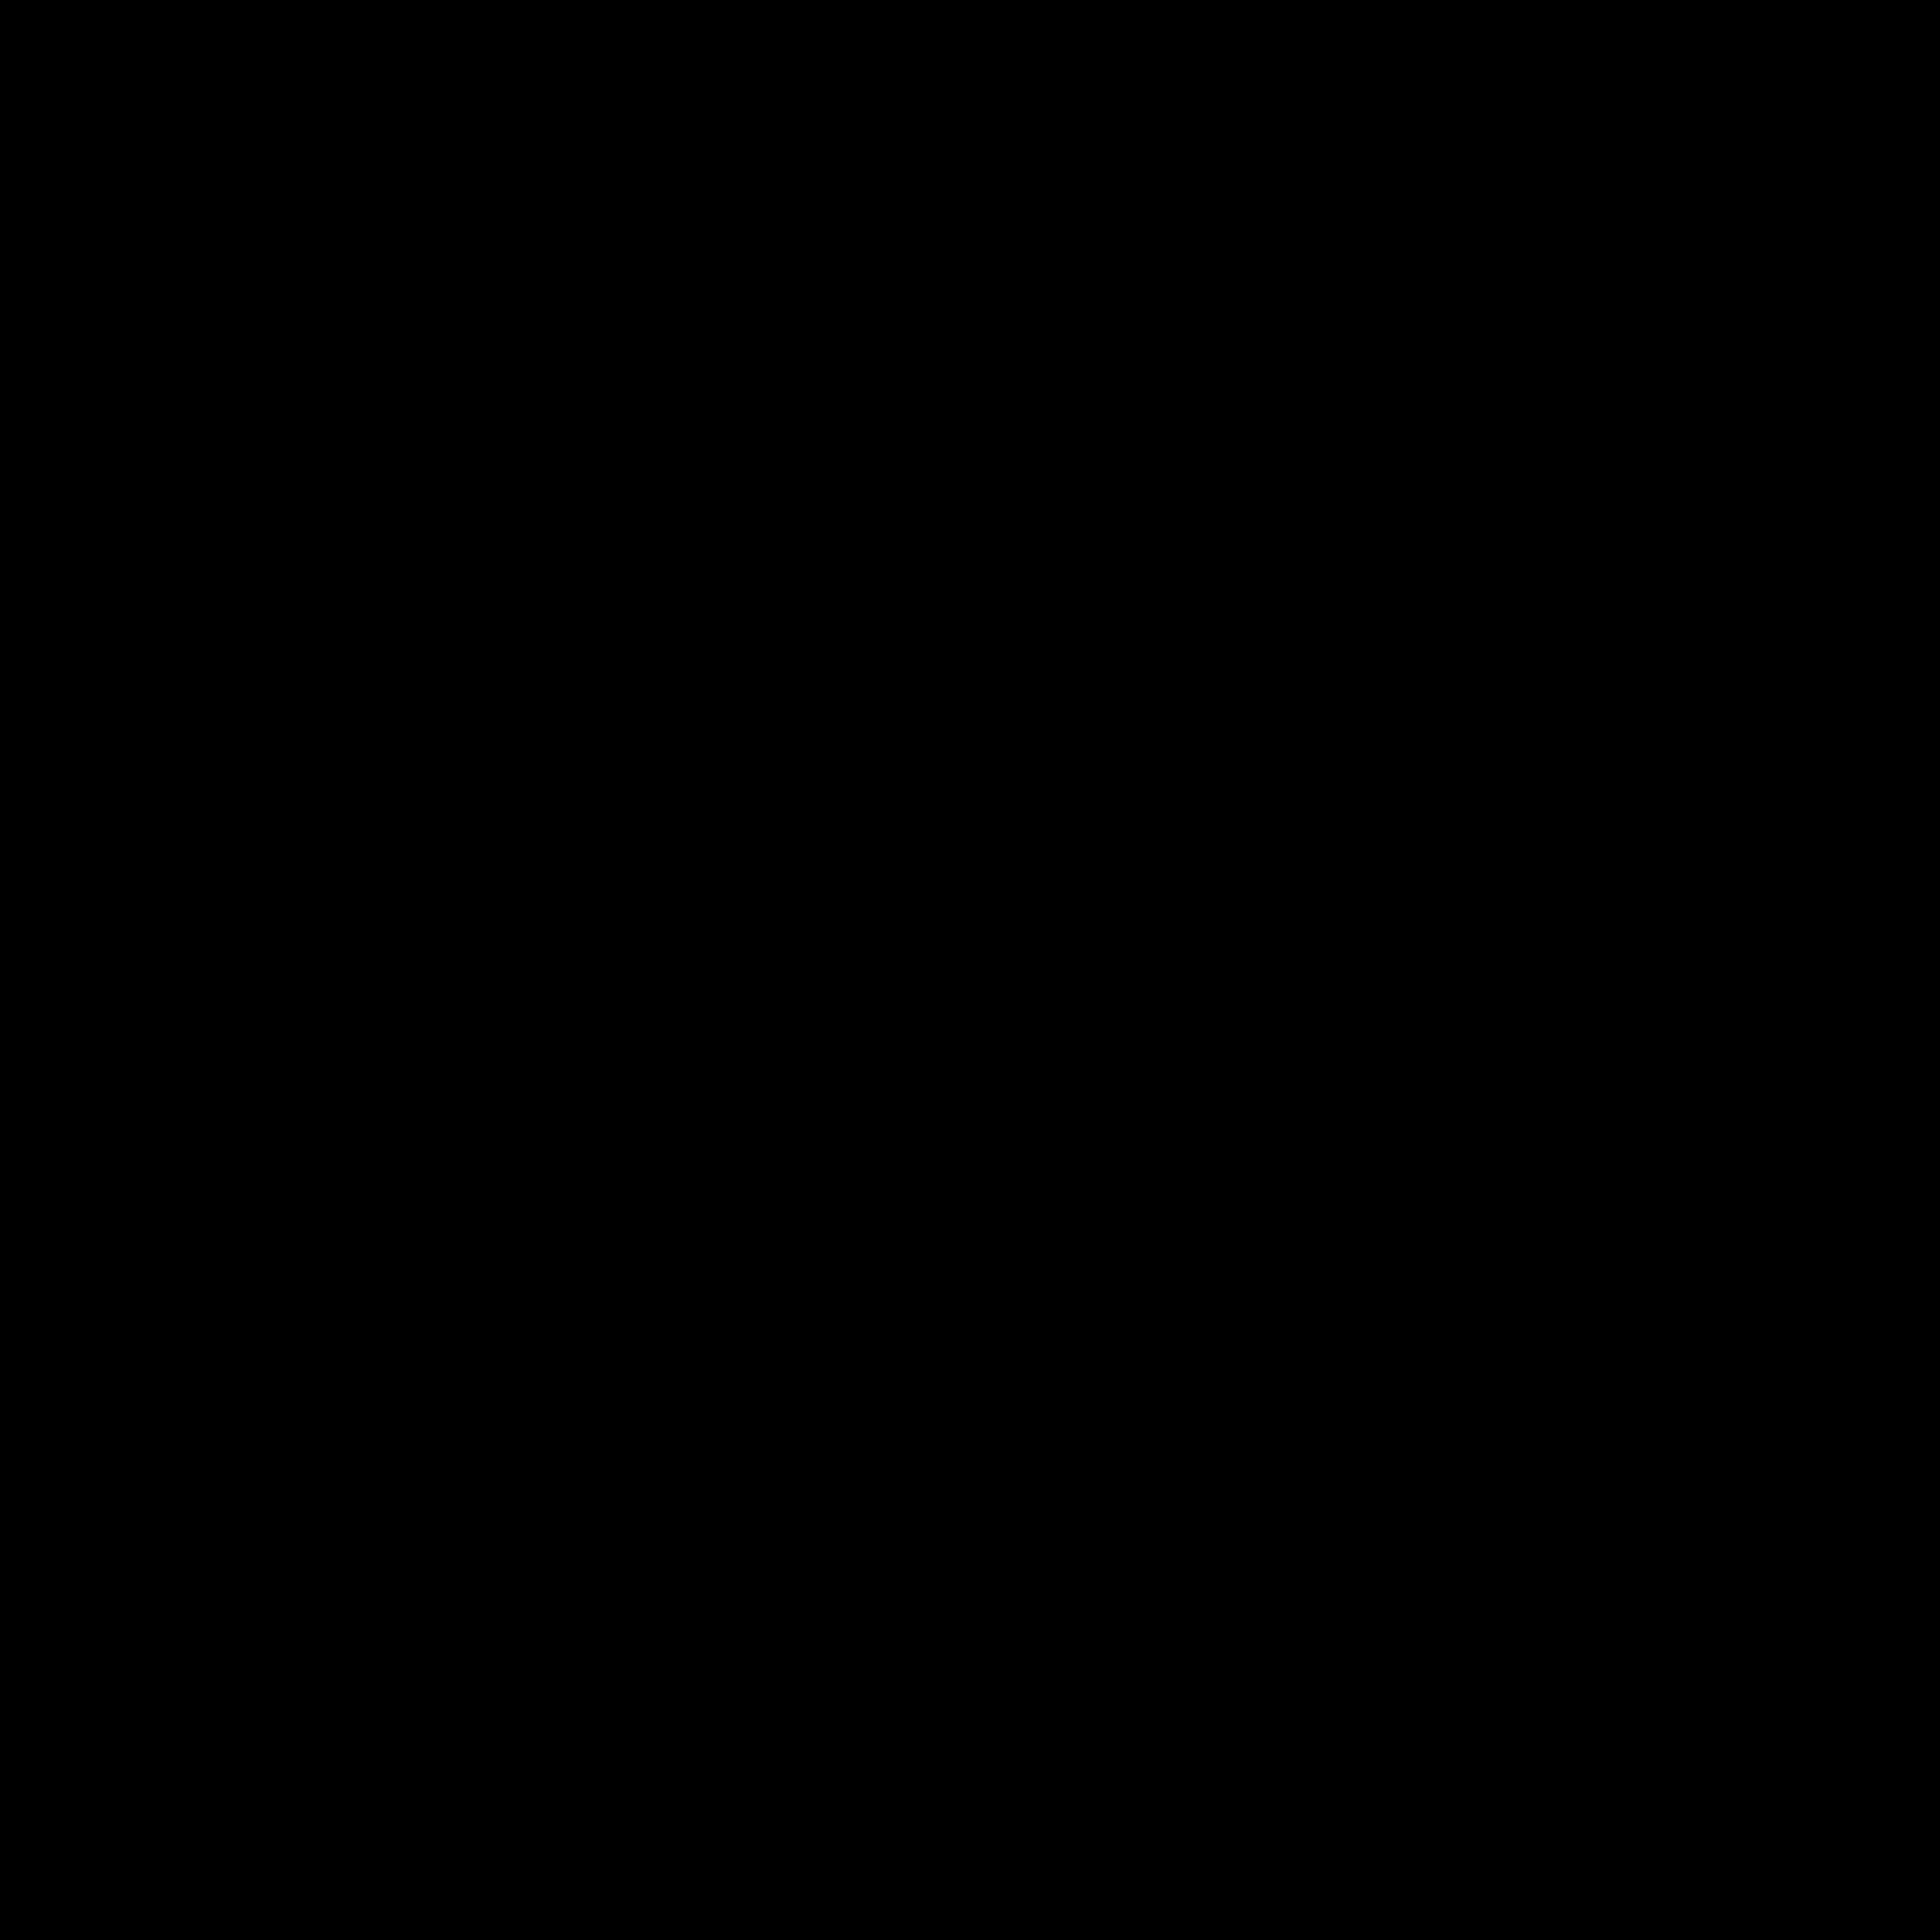 2000x2000 Planet Symbols